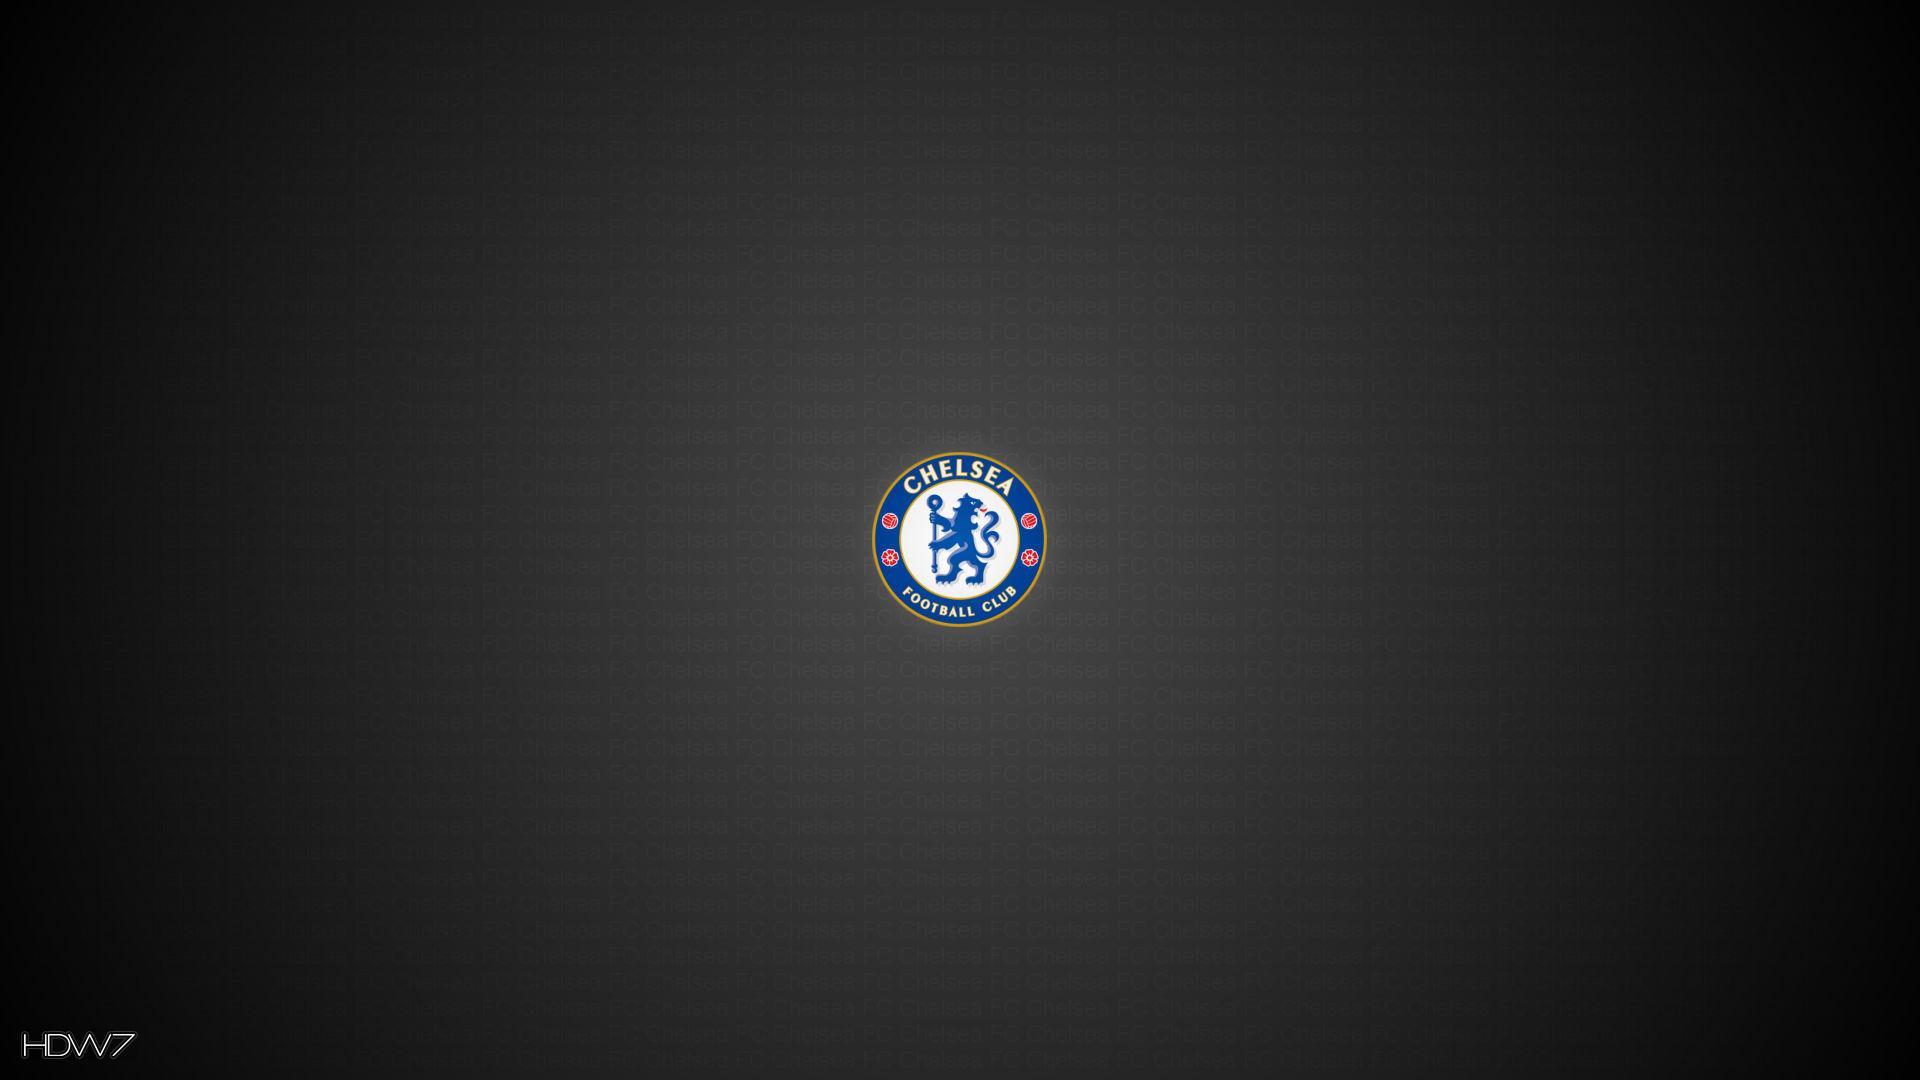 Chelsea fc hd wallpapers wallpapersafari - Chelsea fc wallpaper android hd ...